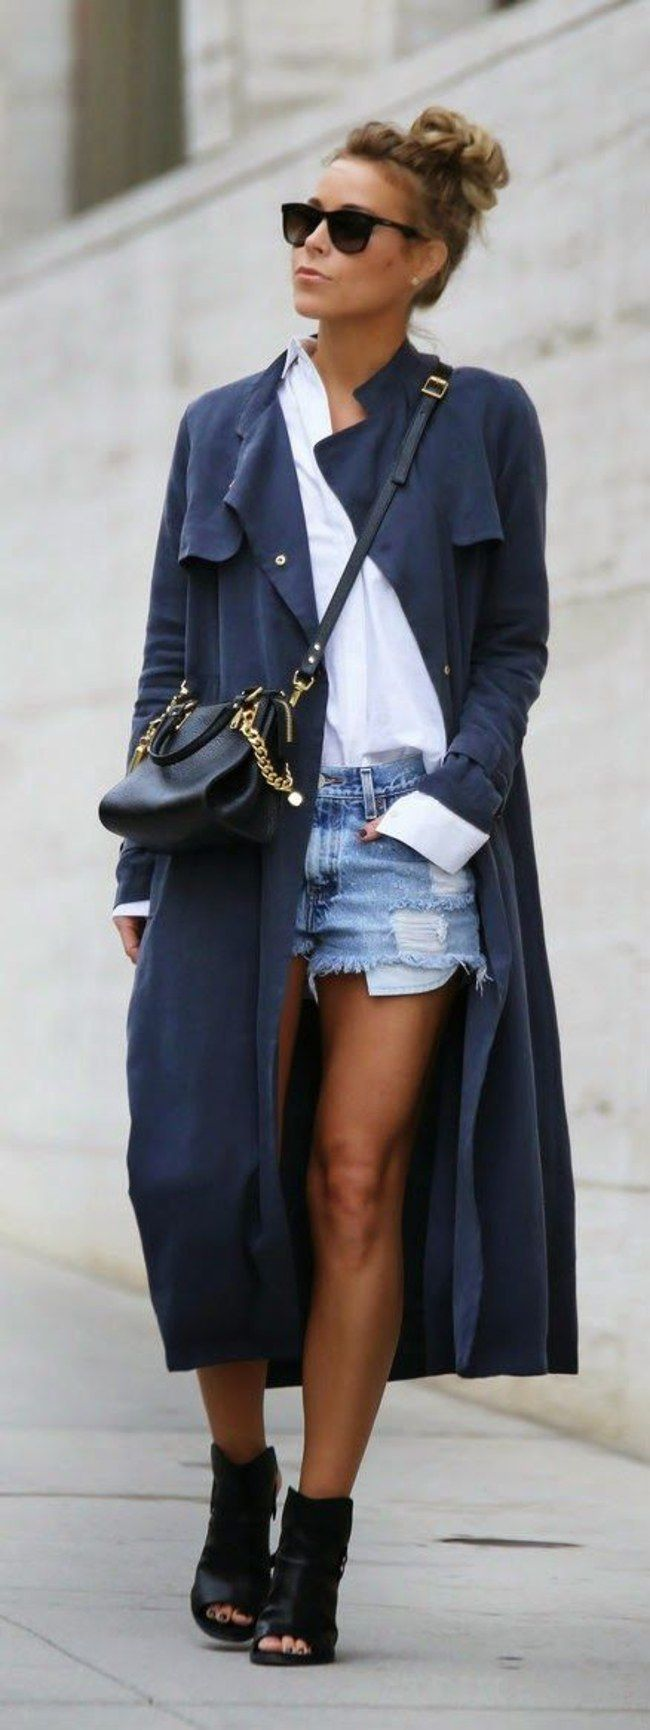 983 best street style & stylizacje images on pinterest   clothes